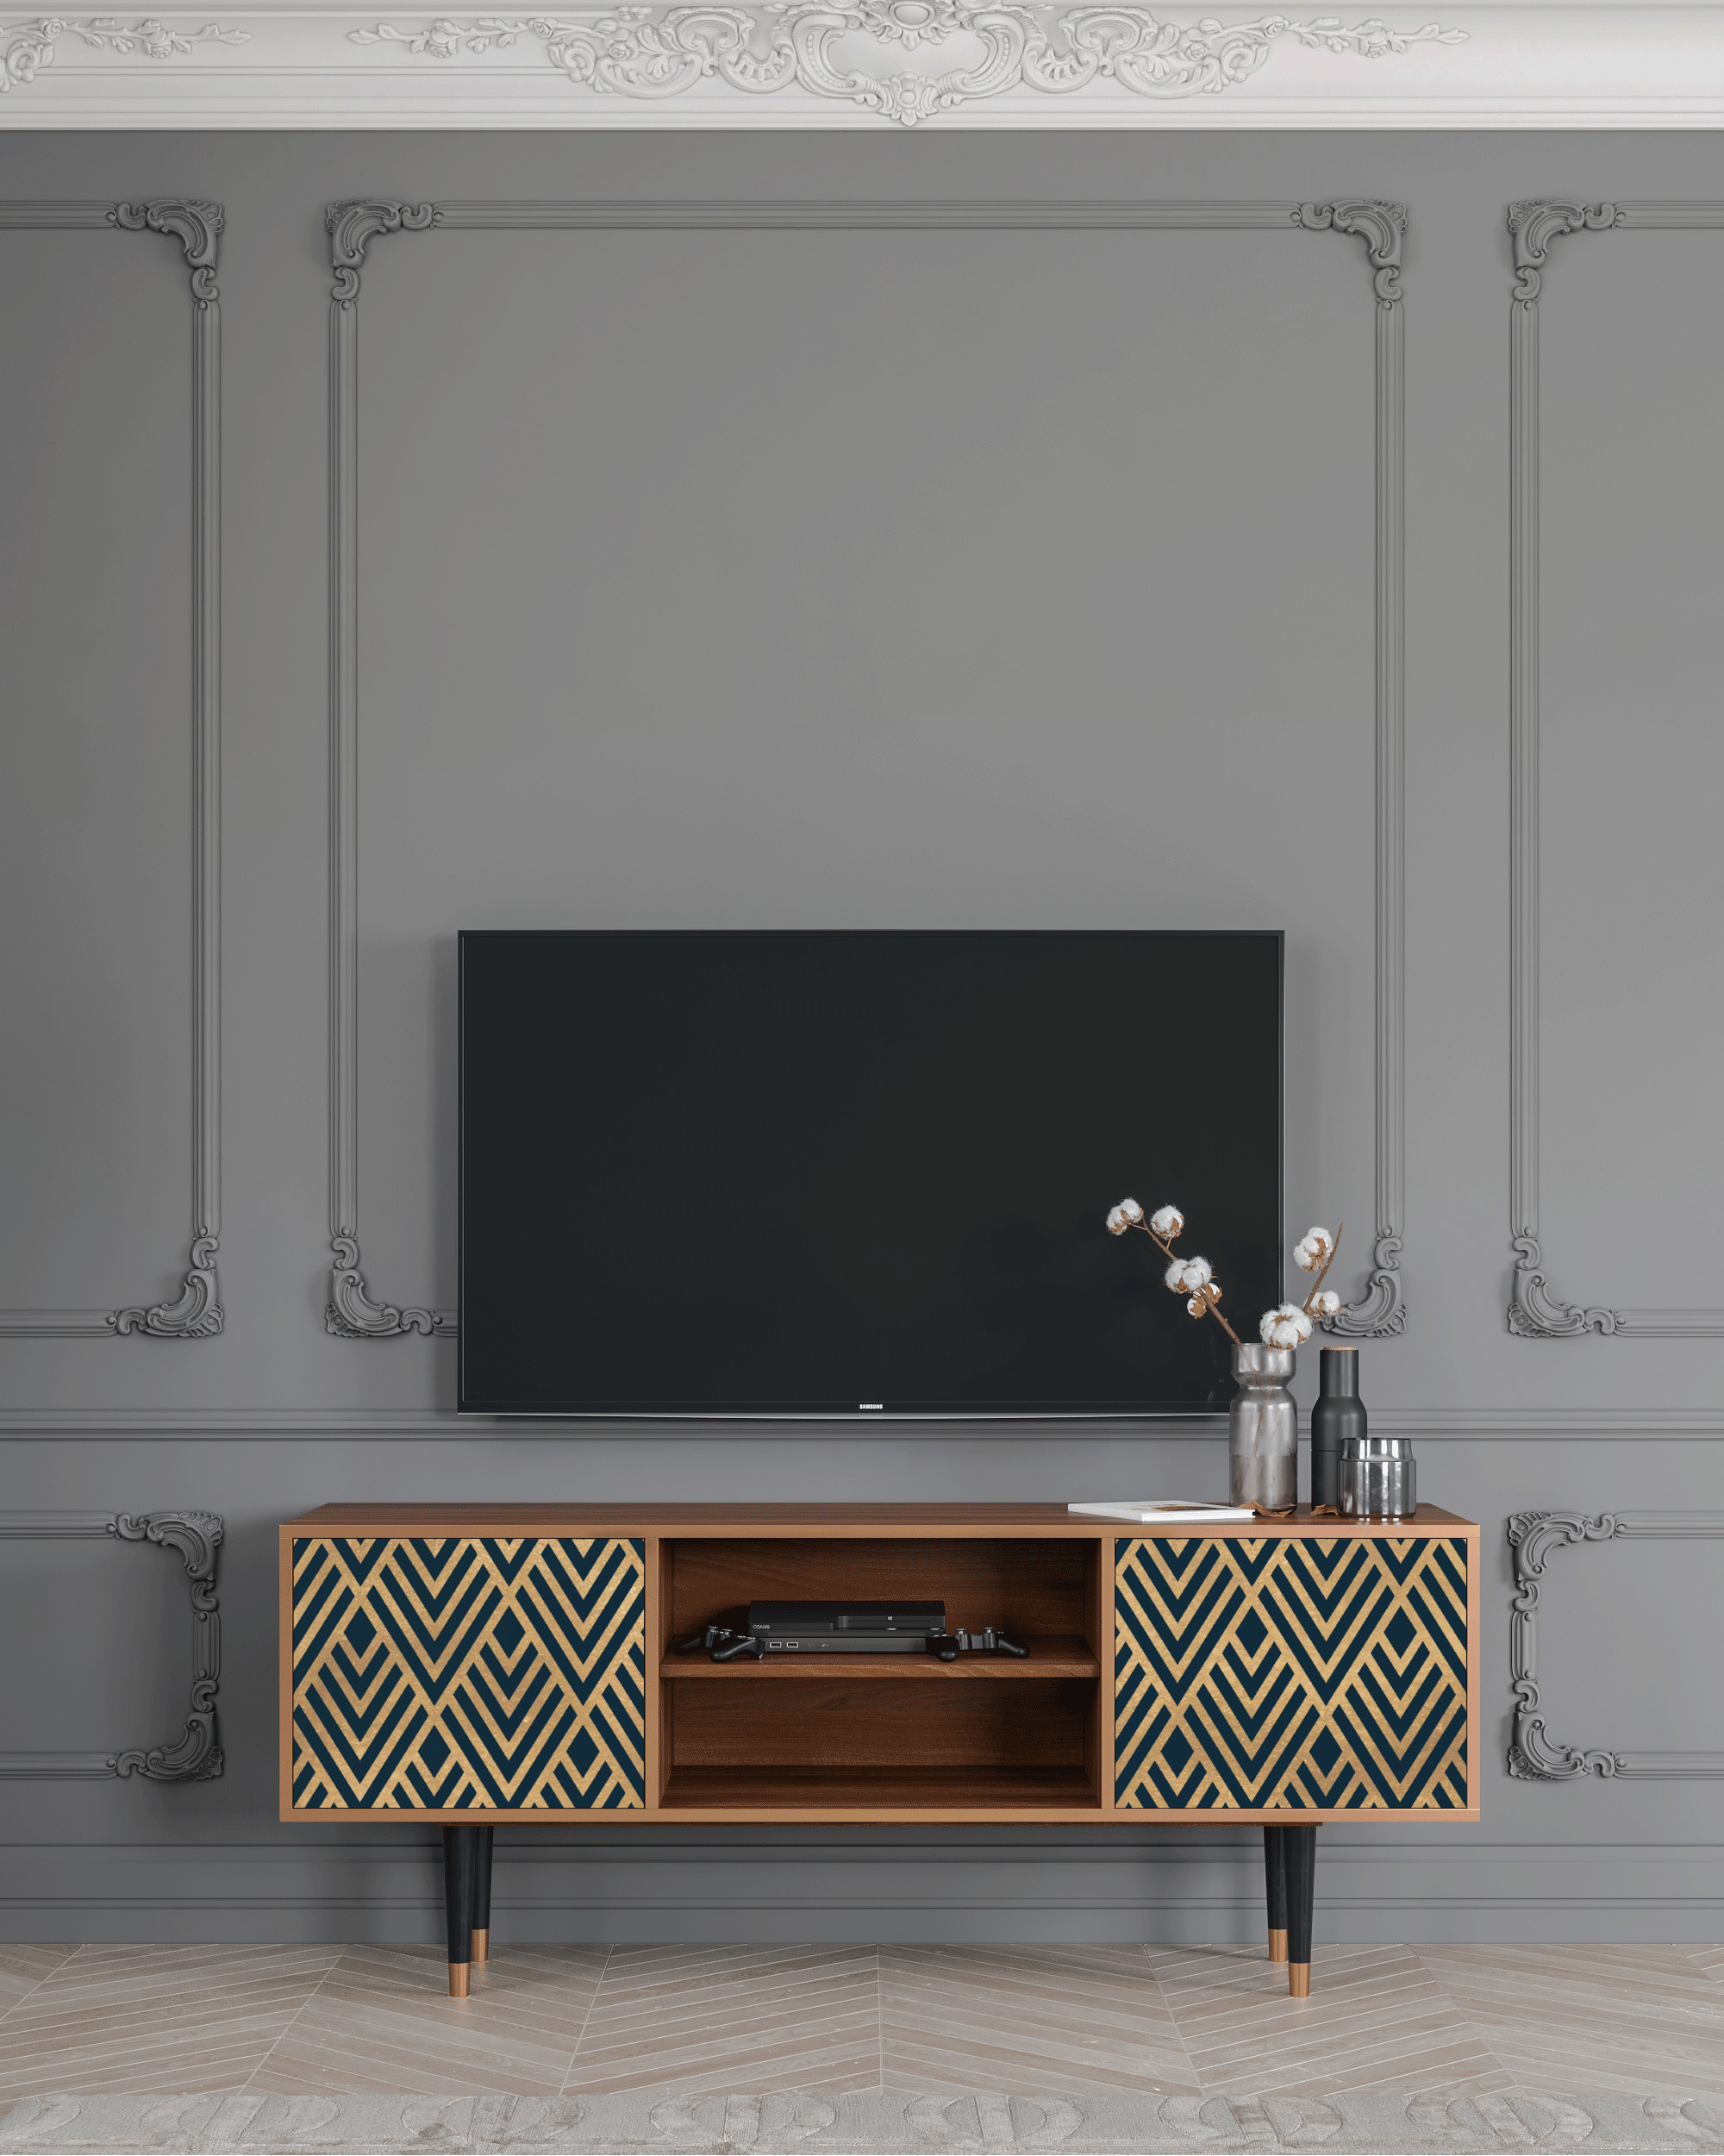 Meuble TV bleu et doré 170cm 2 portes